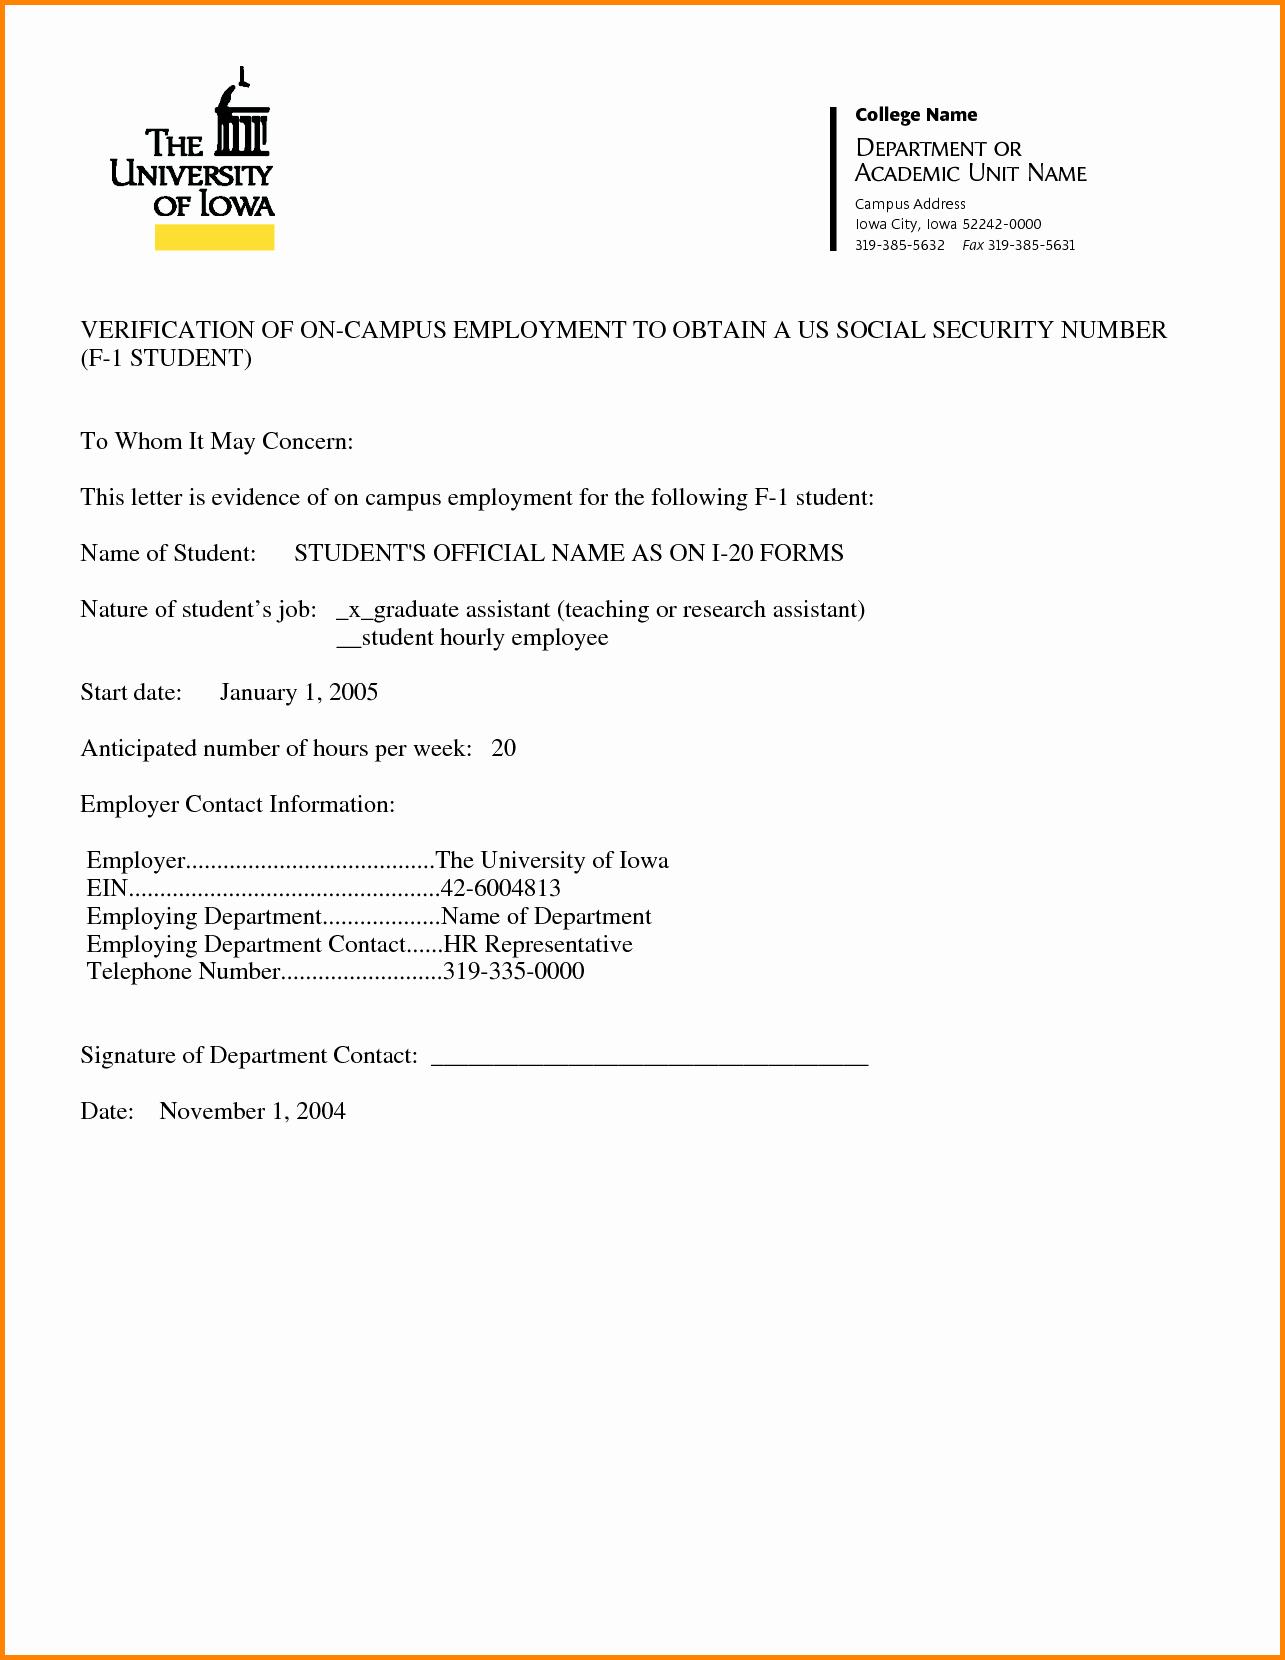 Employment Verification Letter Template Word New Employment Verification Letter Template Word